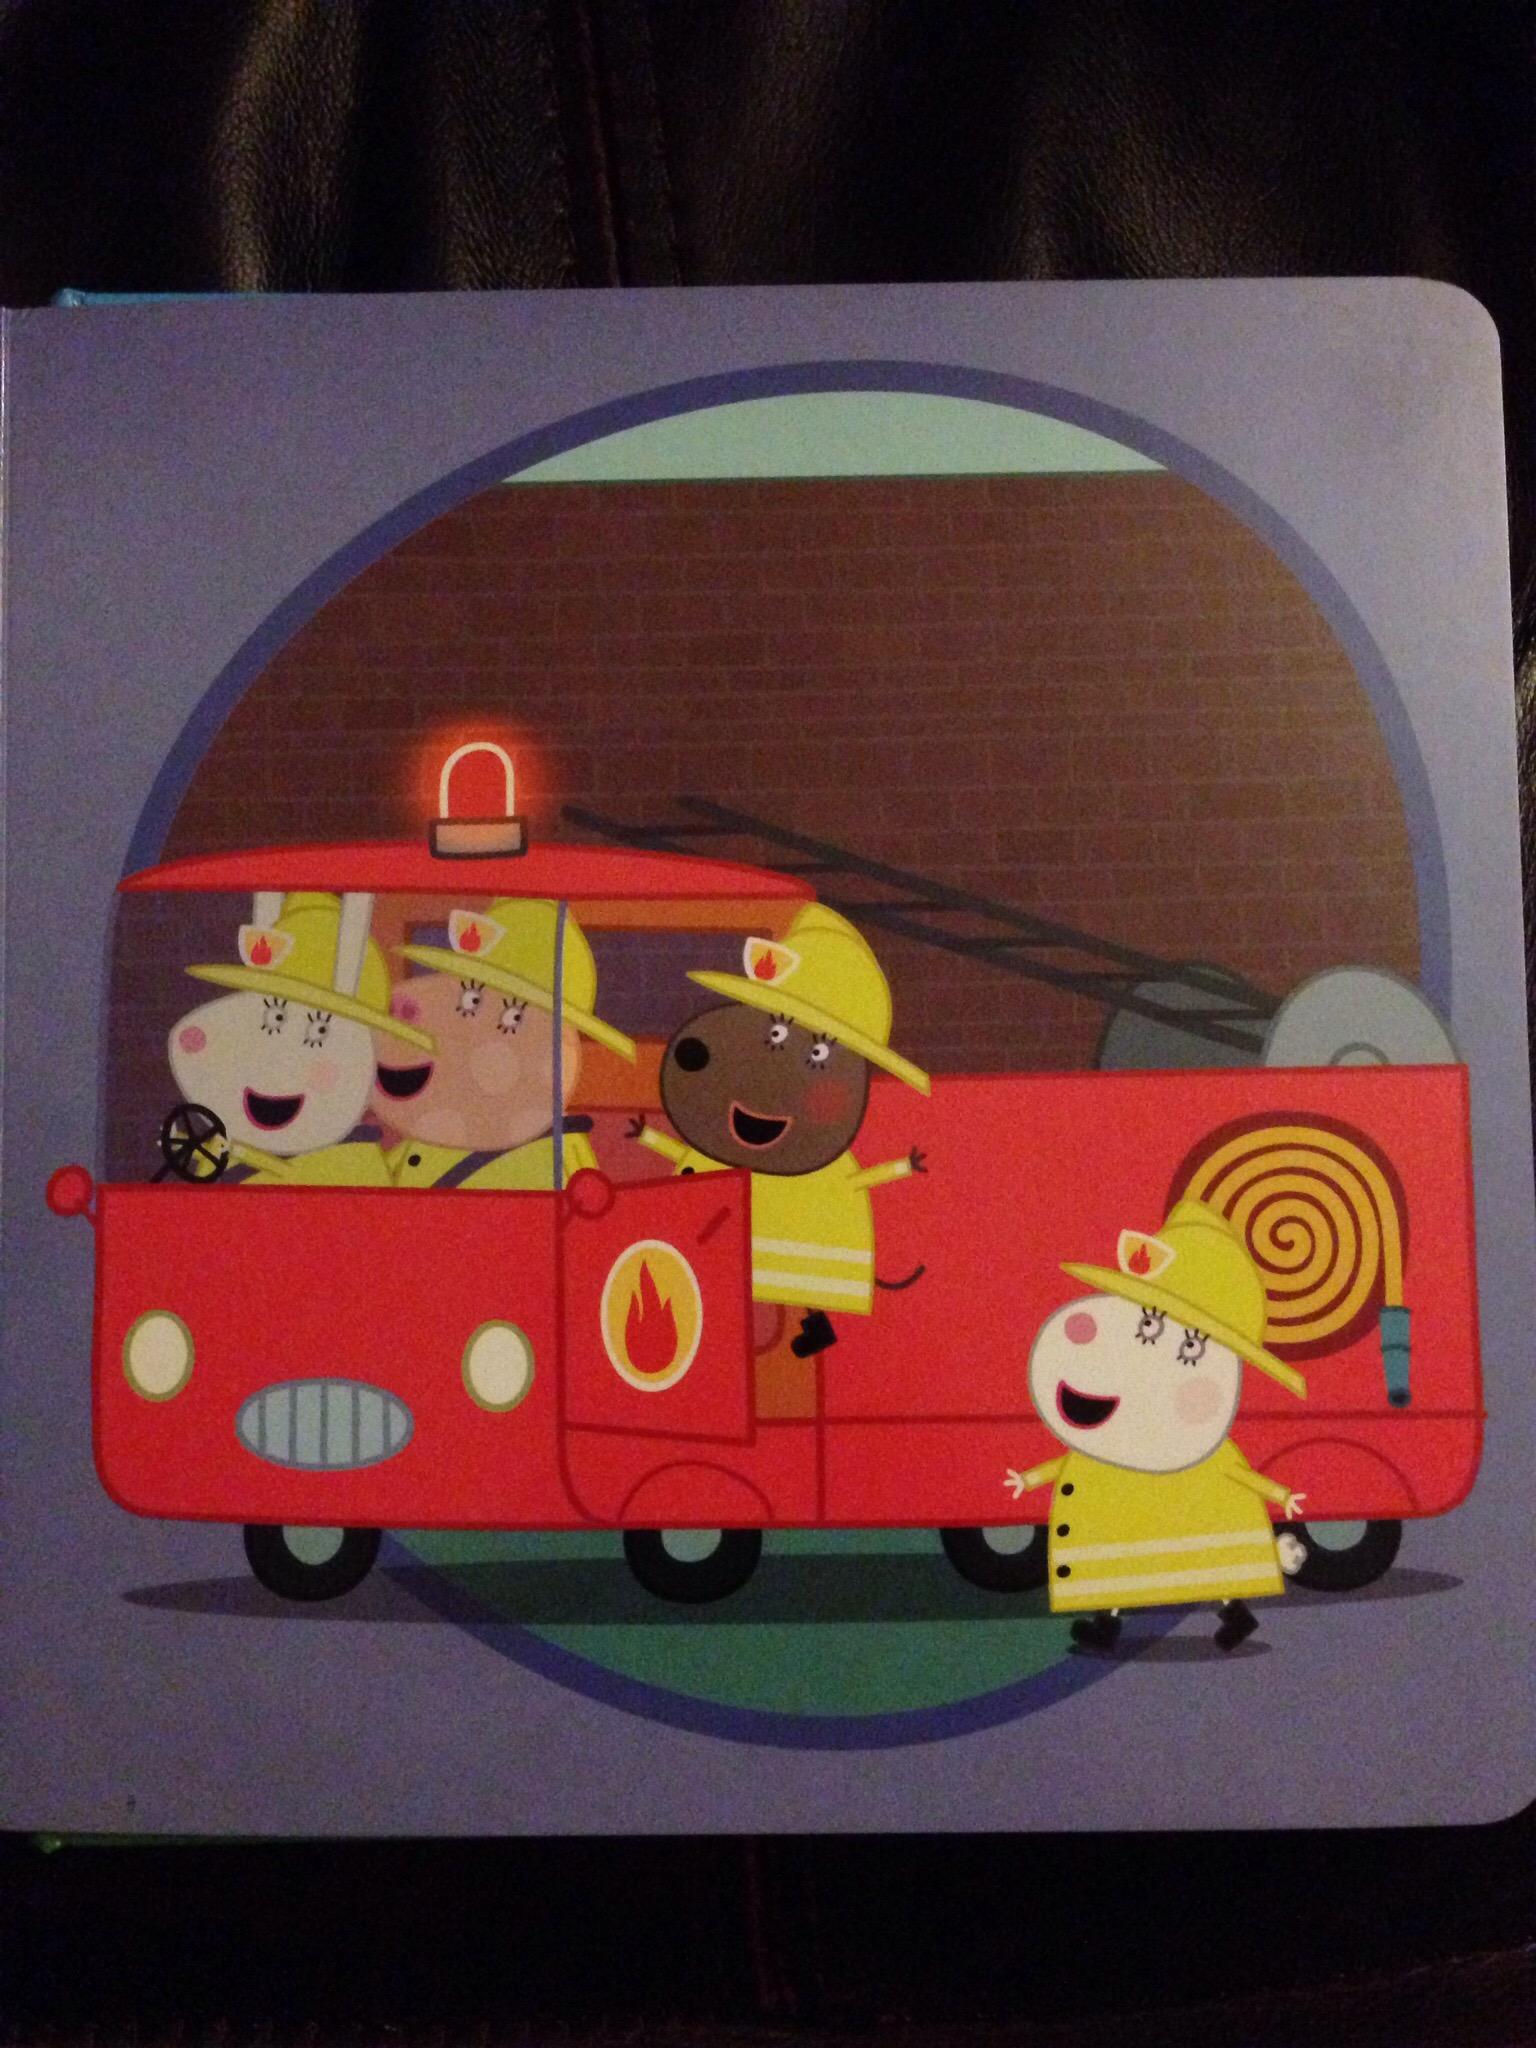 Peppa Pig fire engine book